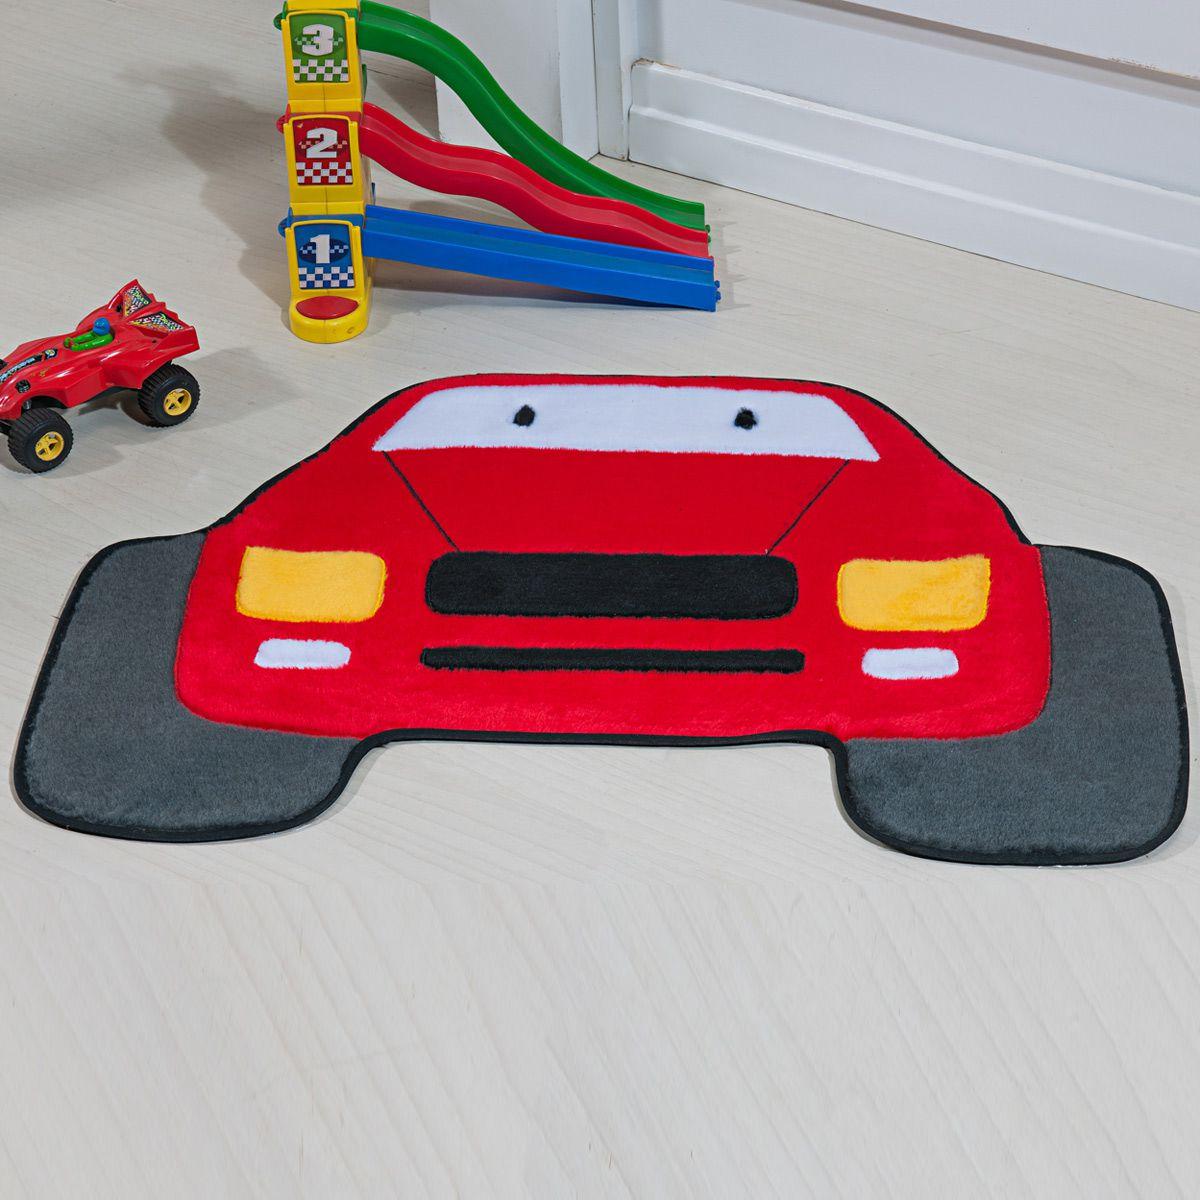 Tapete Infantil Premium Formato Jipe Vermelho 82cm x 60cm